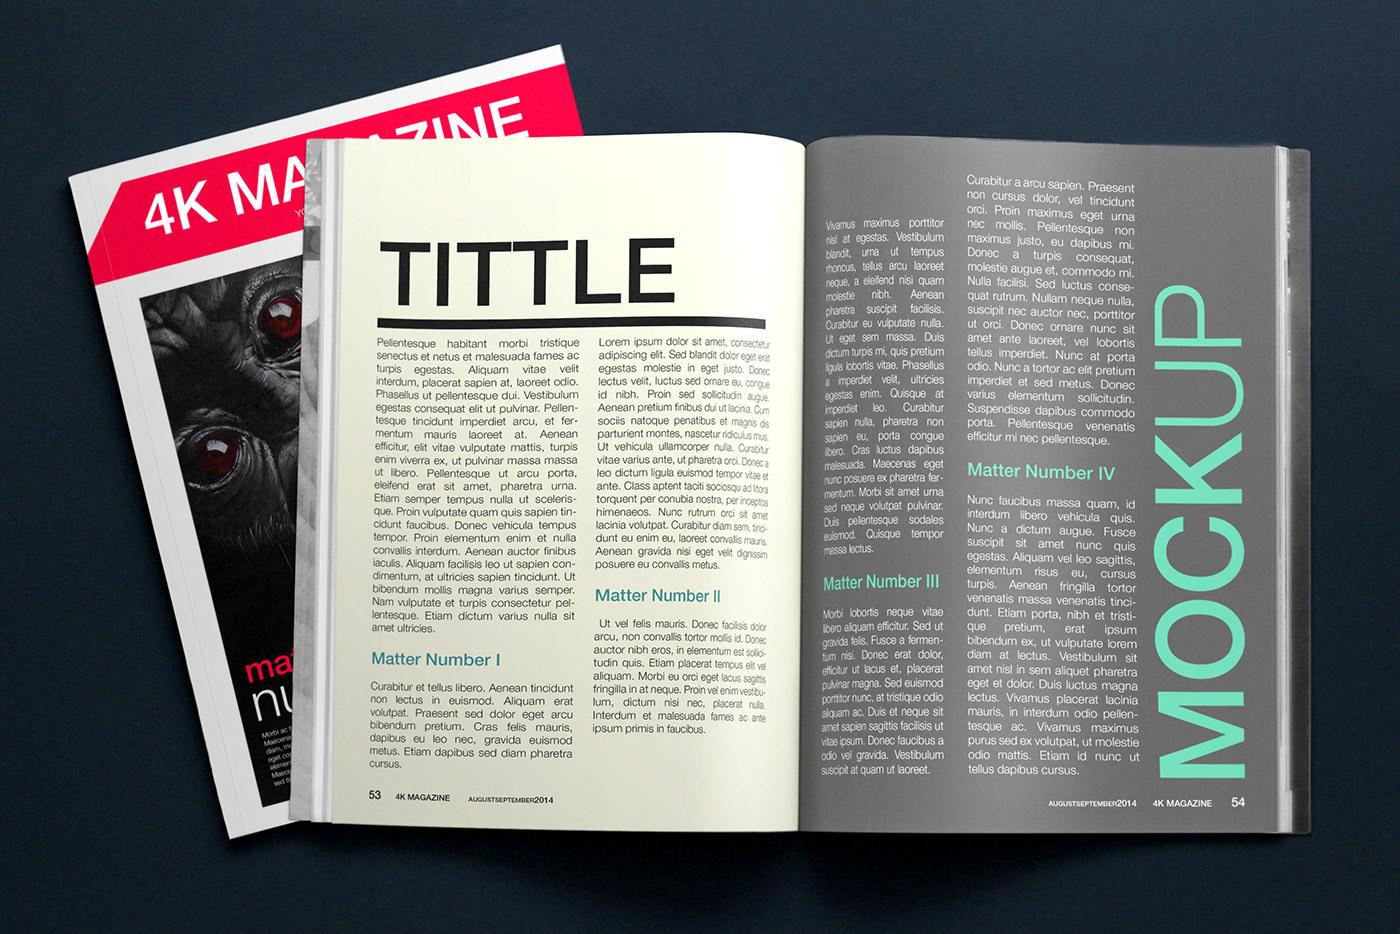 free psd free psd free mockup  Mockup mockup free mock up free free mock up template magazine Magazine mockup